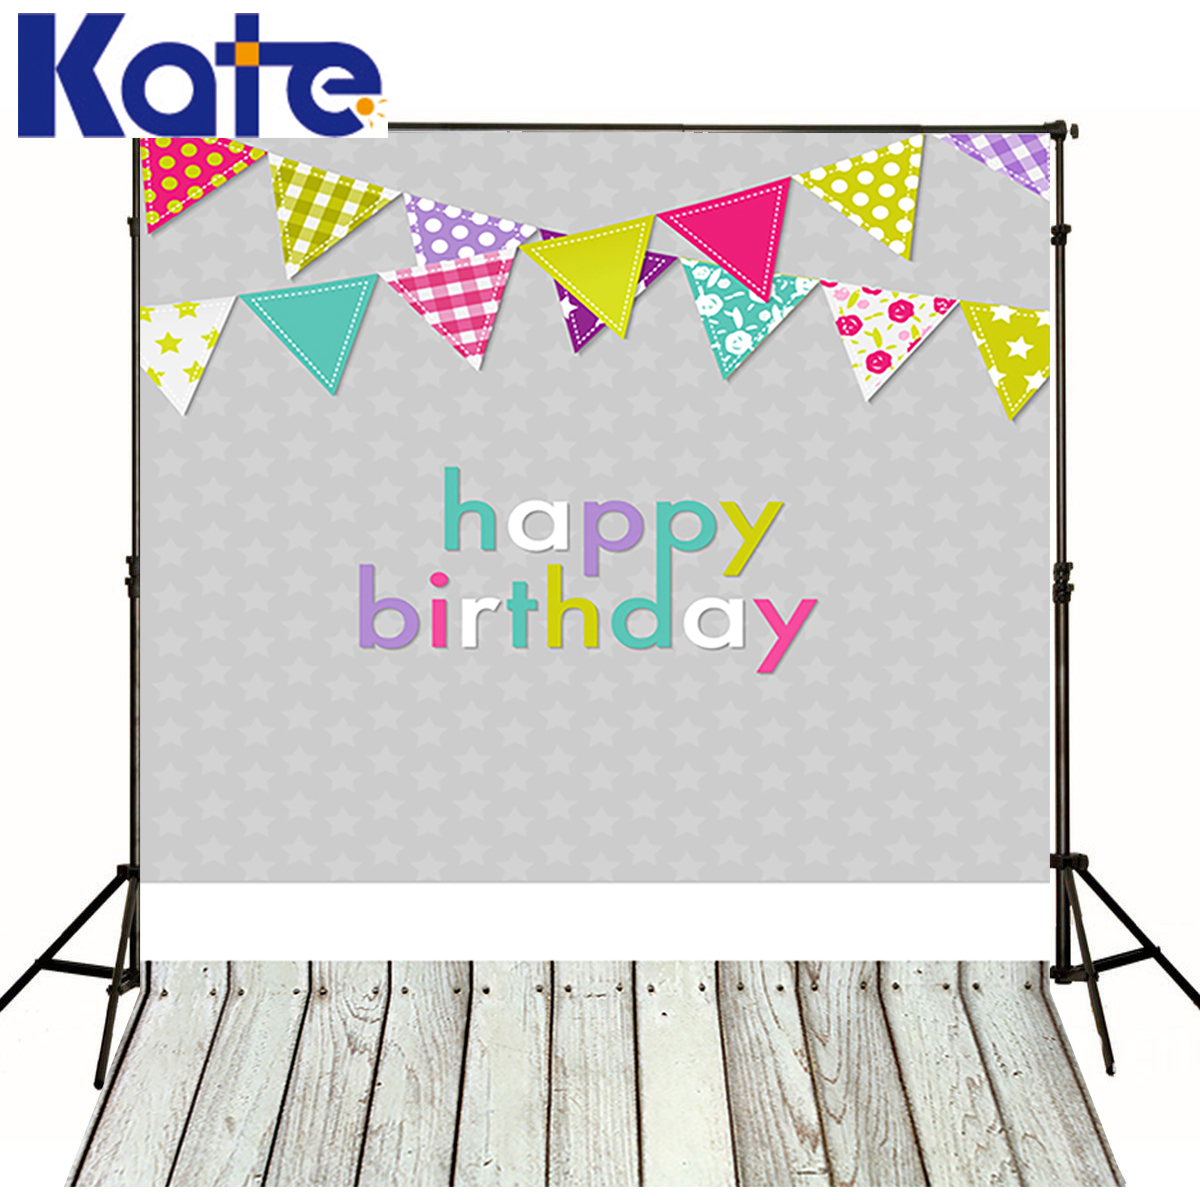 Kate Newborn Baby Backdrops Photo Birthday Colour Flag Fond De Studio De Dark Wood Texture Floor Background For Photo Studio  недорого